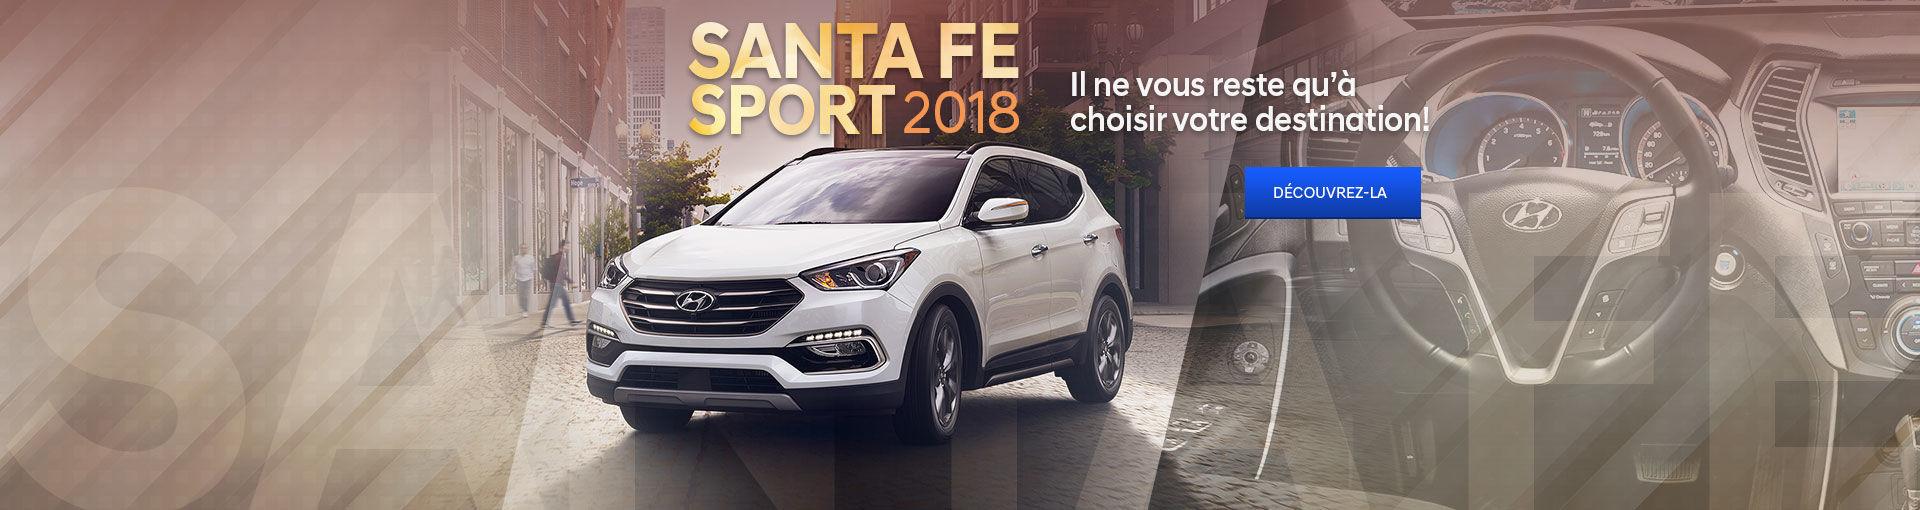 SantaFe Sport 2018